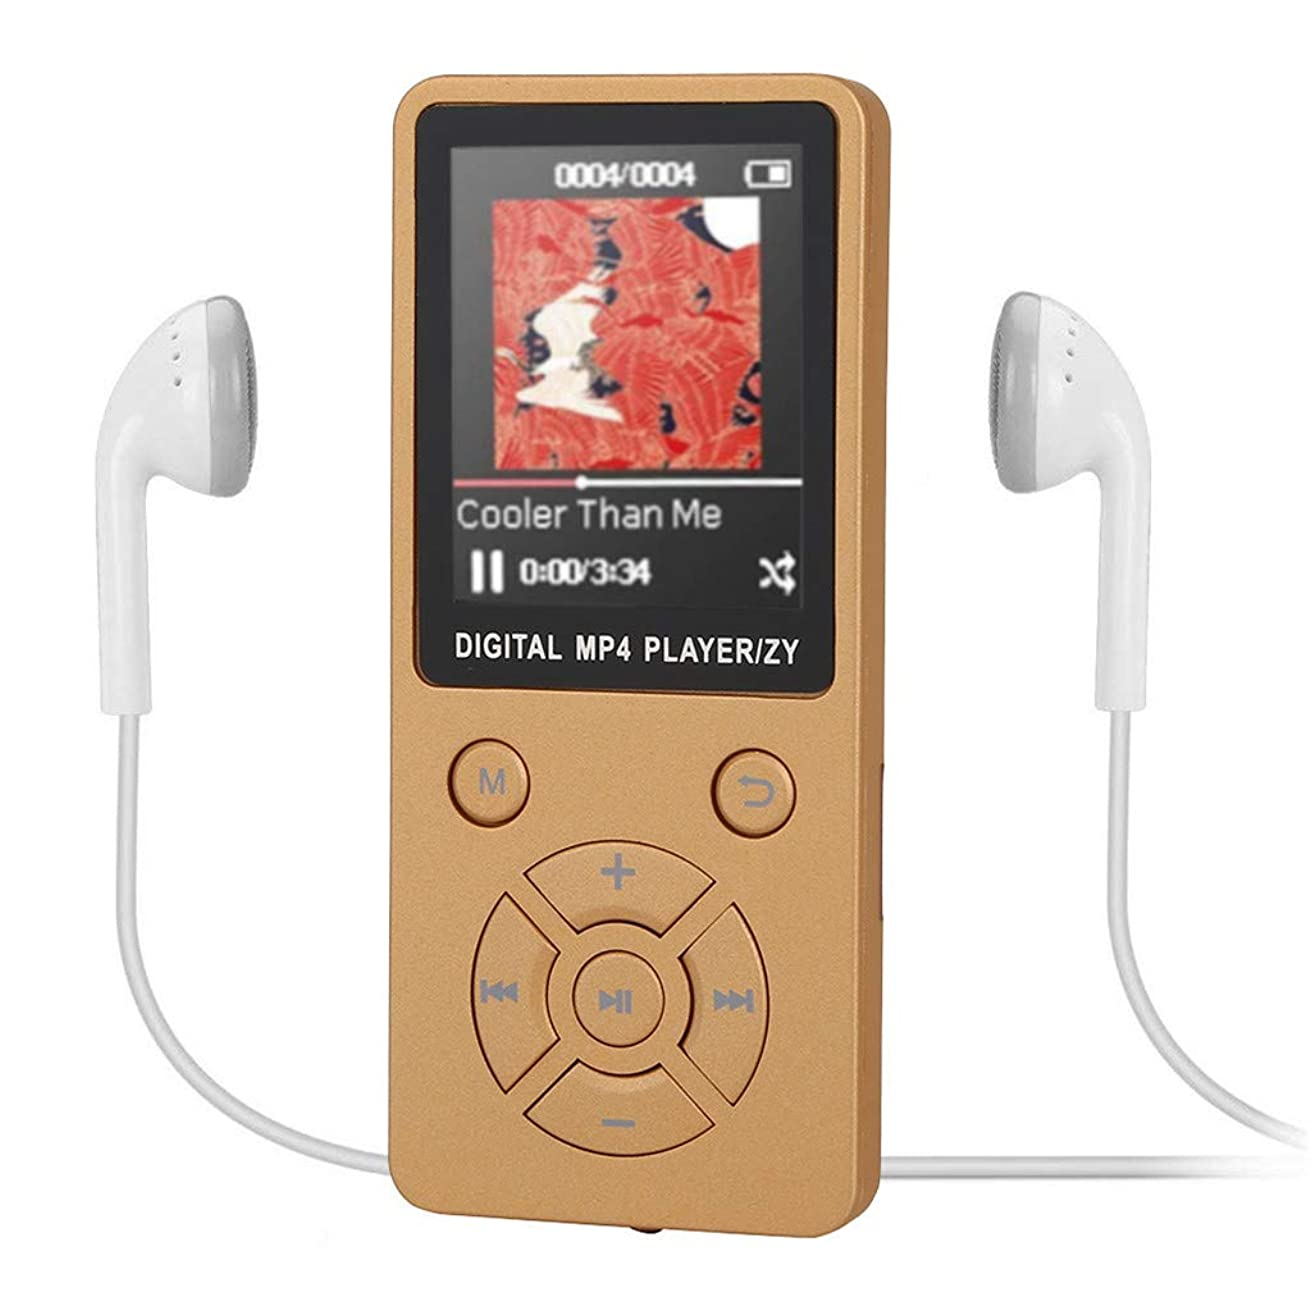 Lankcook Portable Bluetooth MP3 MP4 Player Colour Screen FM Radio Video Games Movie